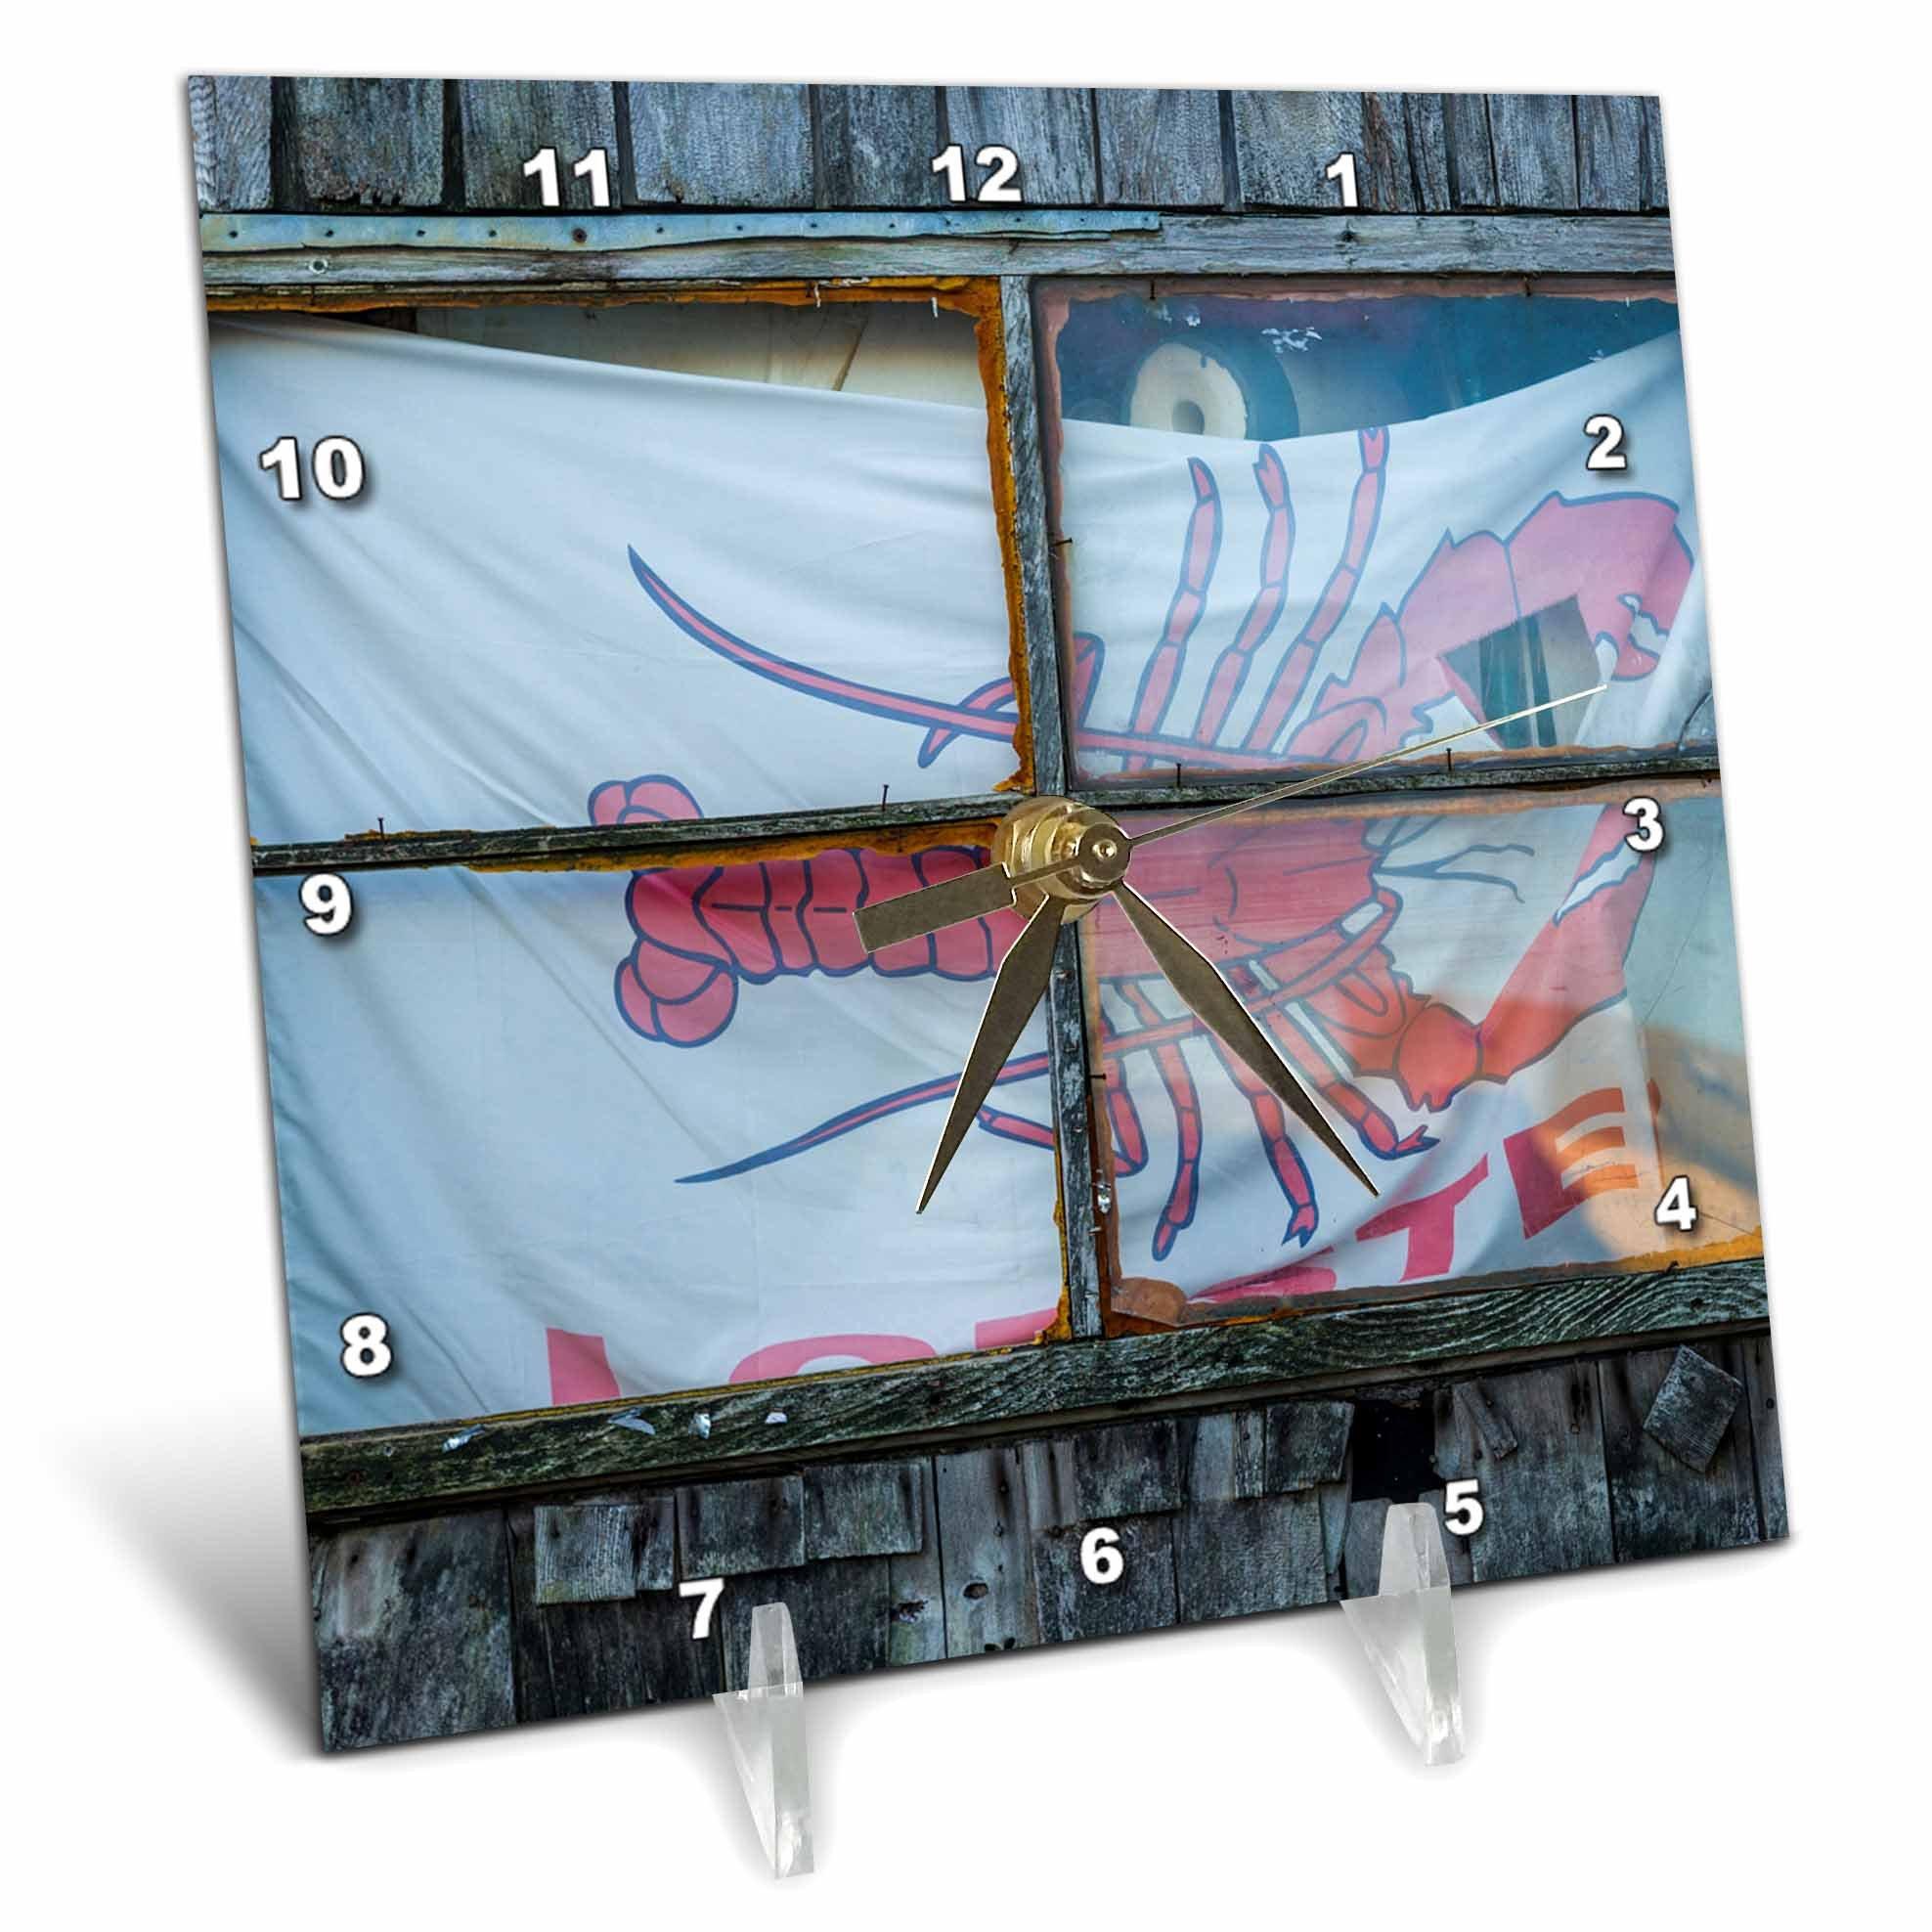 3dRose Danita Delimont - Architecture - USA, Massachusetts, Cape Ann, Rockport, lobster shack window - 6x6 Desk Clock (dc_259462_1)